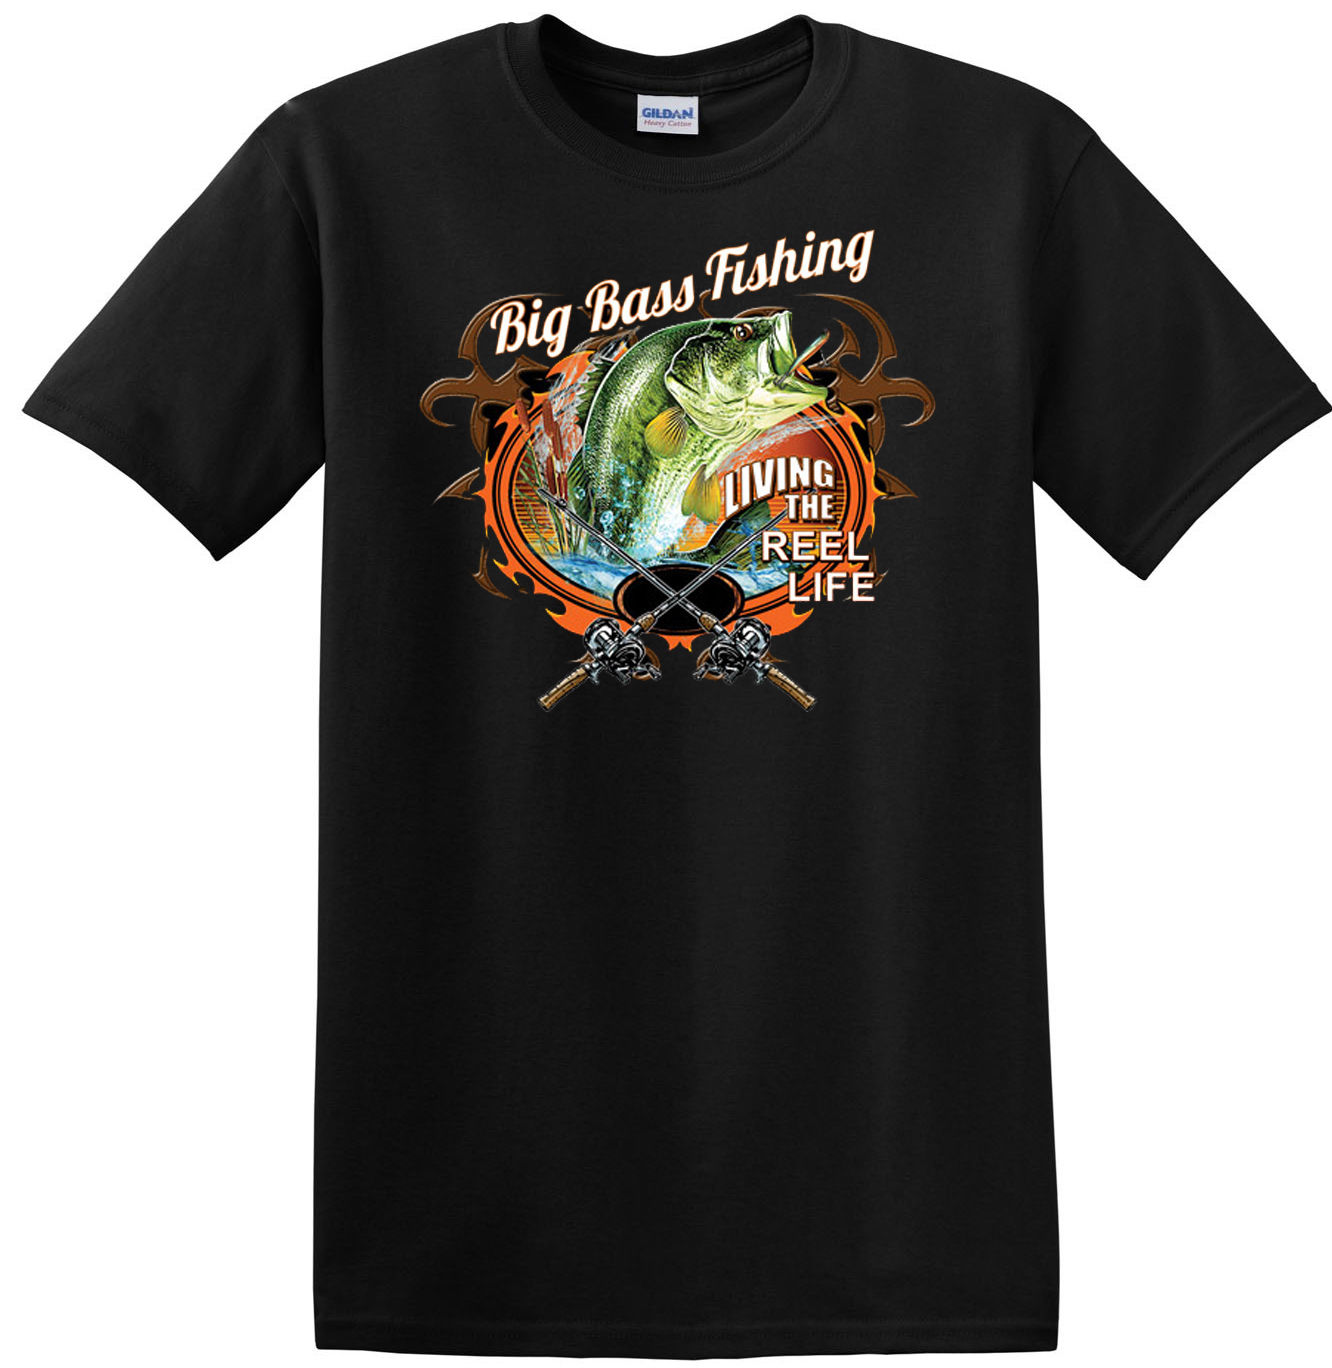 BIG BASS FISHINGer FRONT AND BACK BLACK CREW NECK SHORT